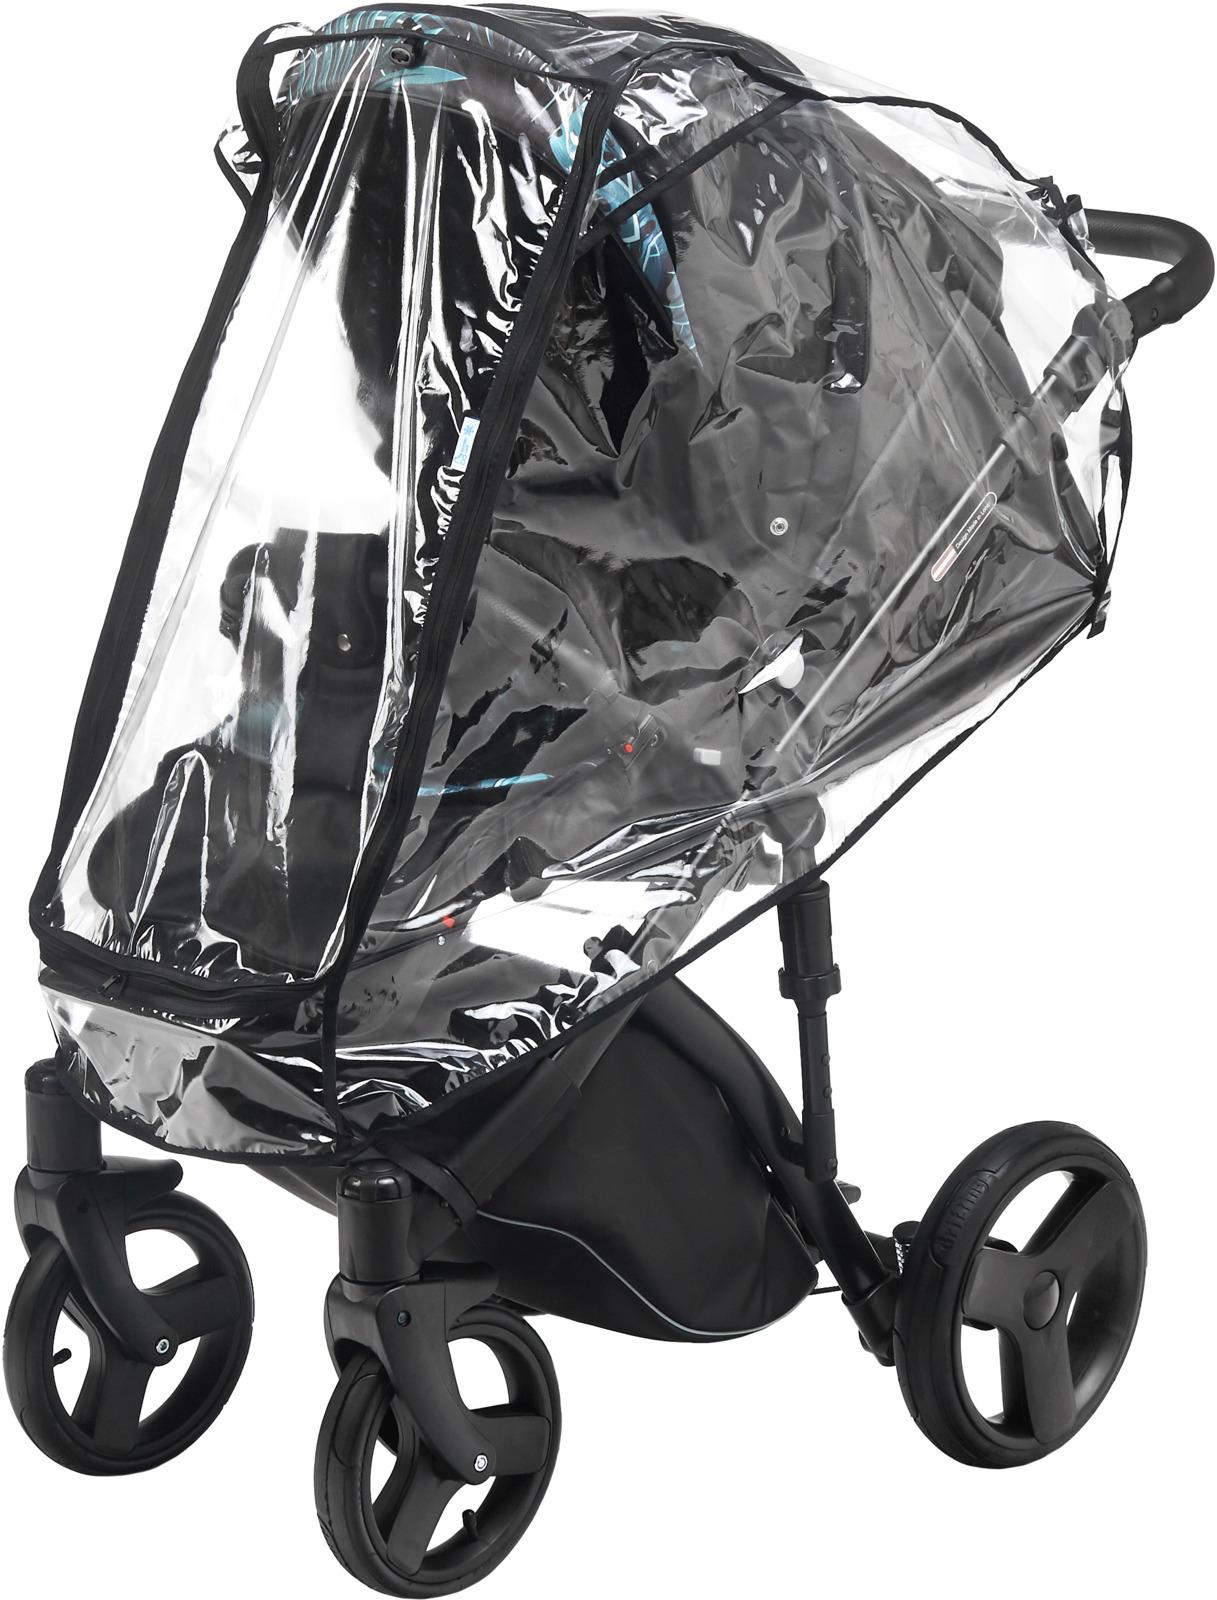 Дождевик для коляски Noordline, RA-PVH-022 муфта tigger warmhands на ручку коляски